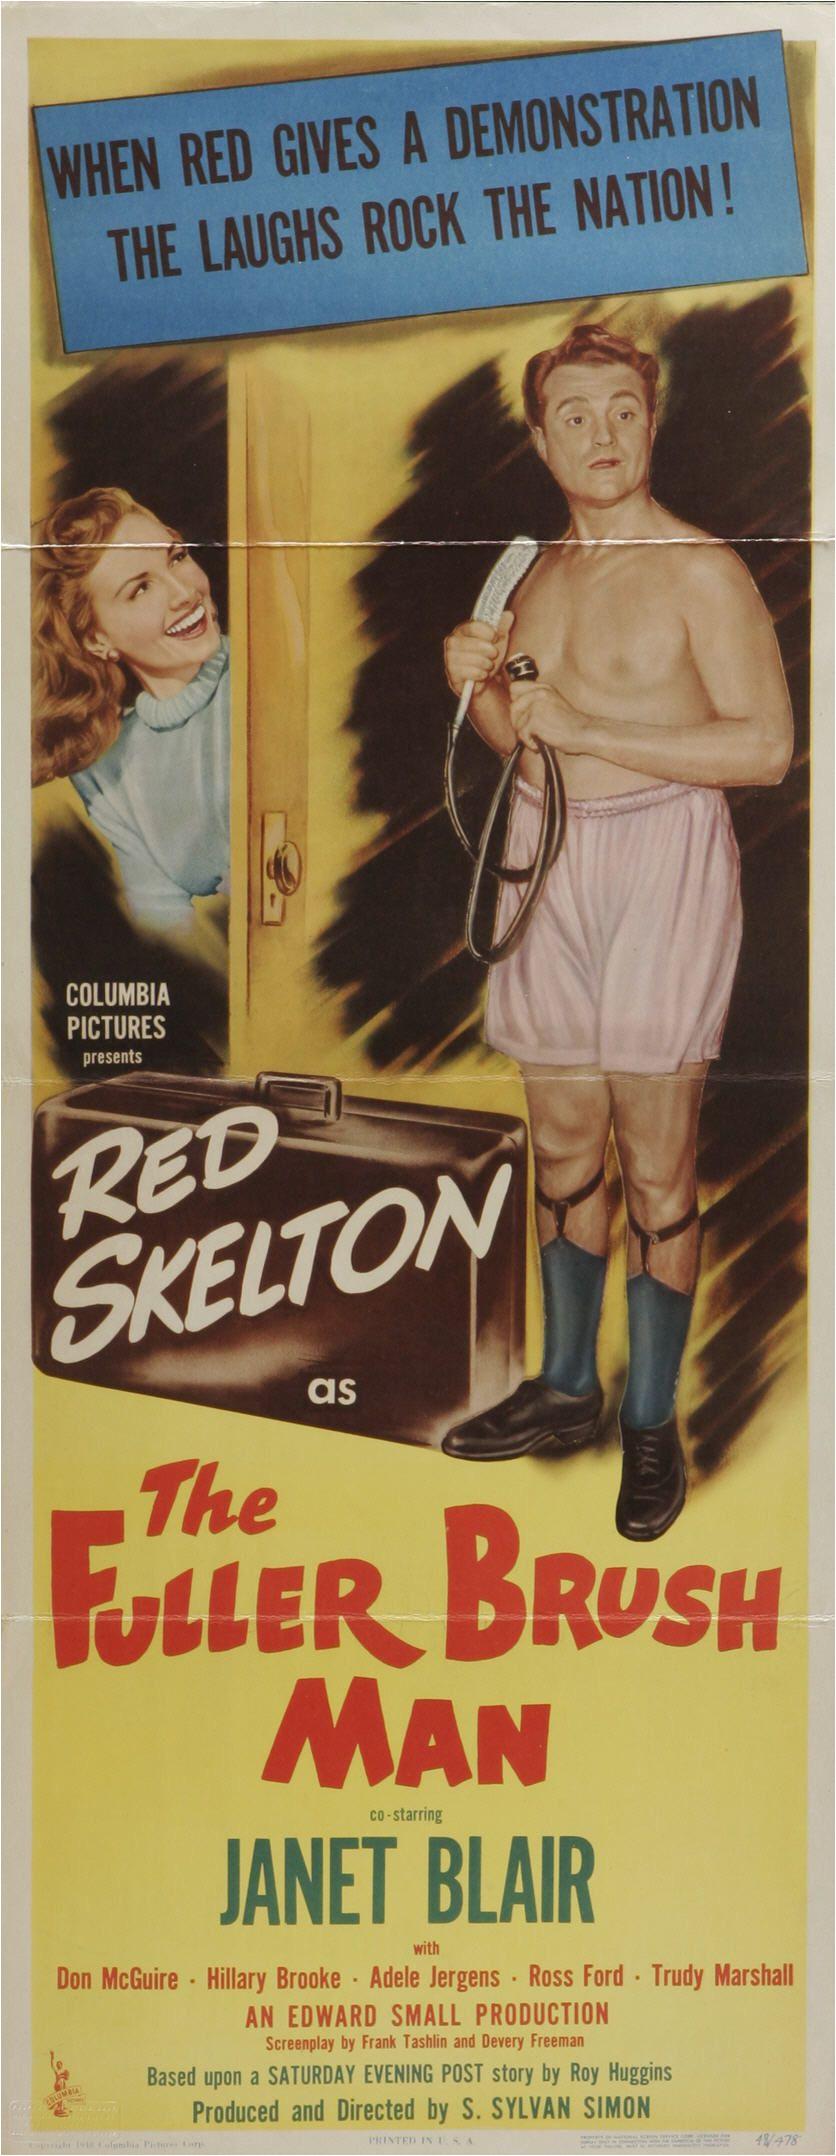 the fuller brush man 1948 stars red skelton janet blair don mcguire hillary brooke adele jergens donald curtis director s sylvan simon